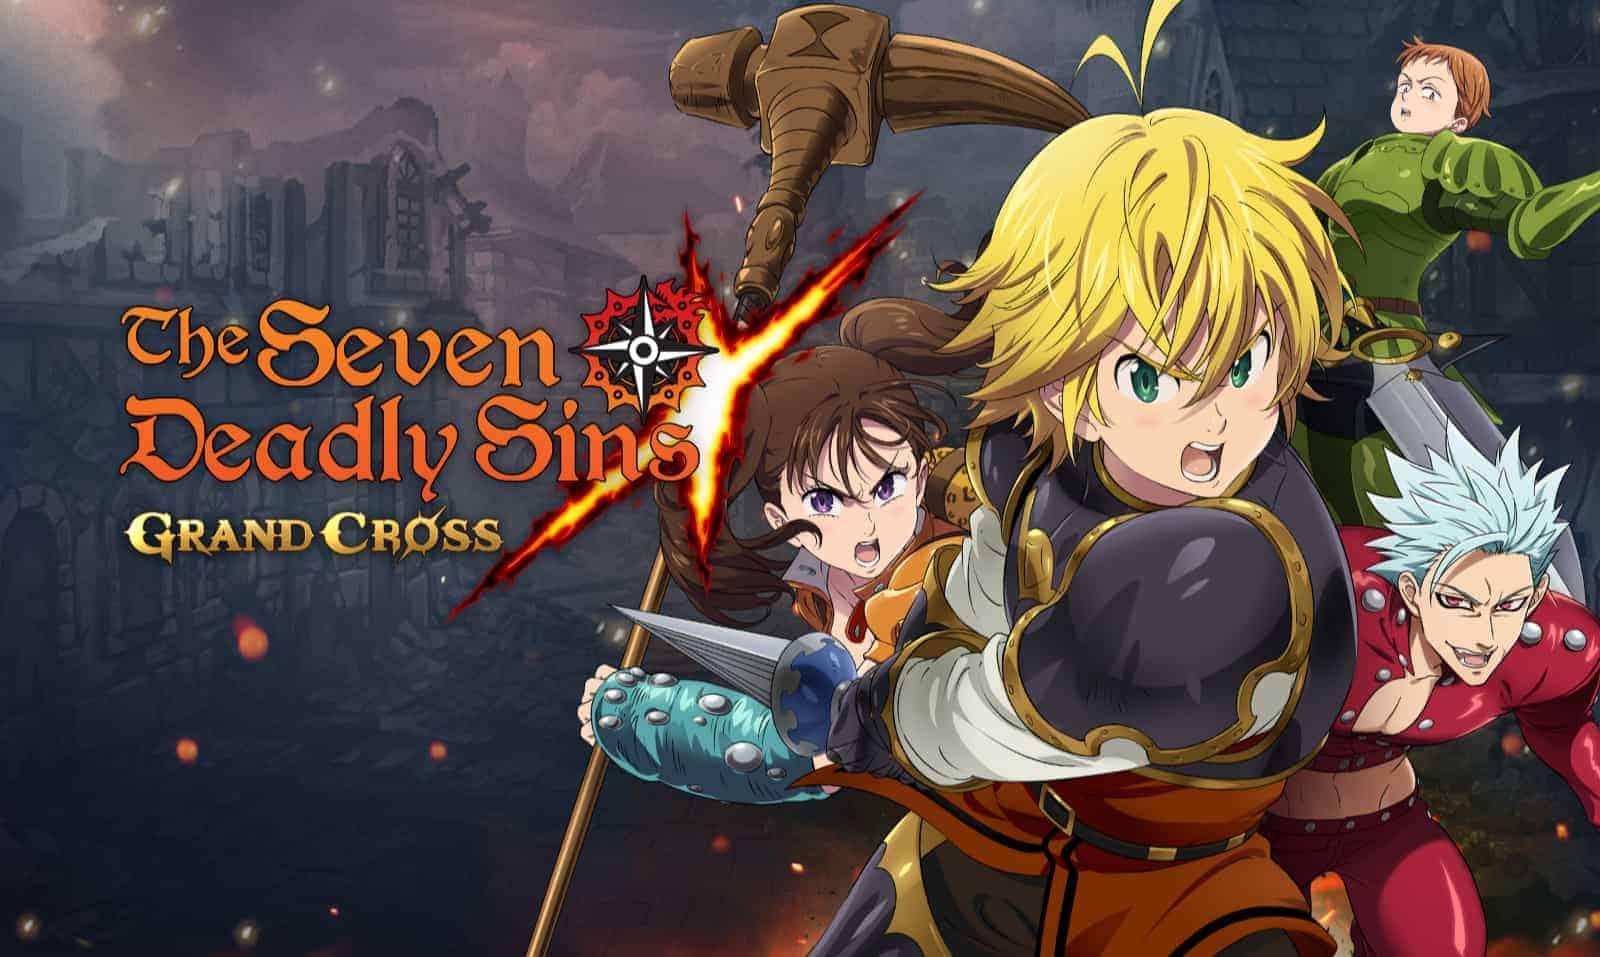 The Seven Deadly Sins Grand Cross Reaches 3 Million Global Downloads